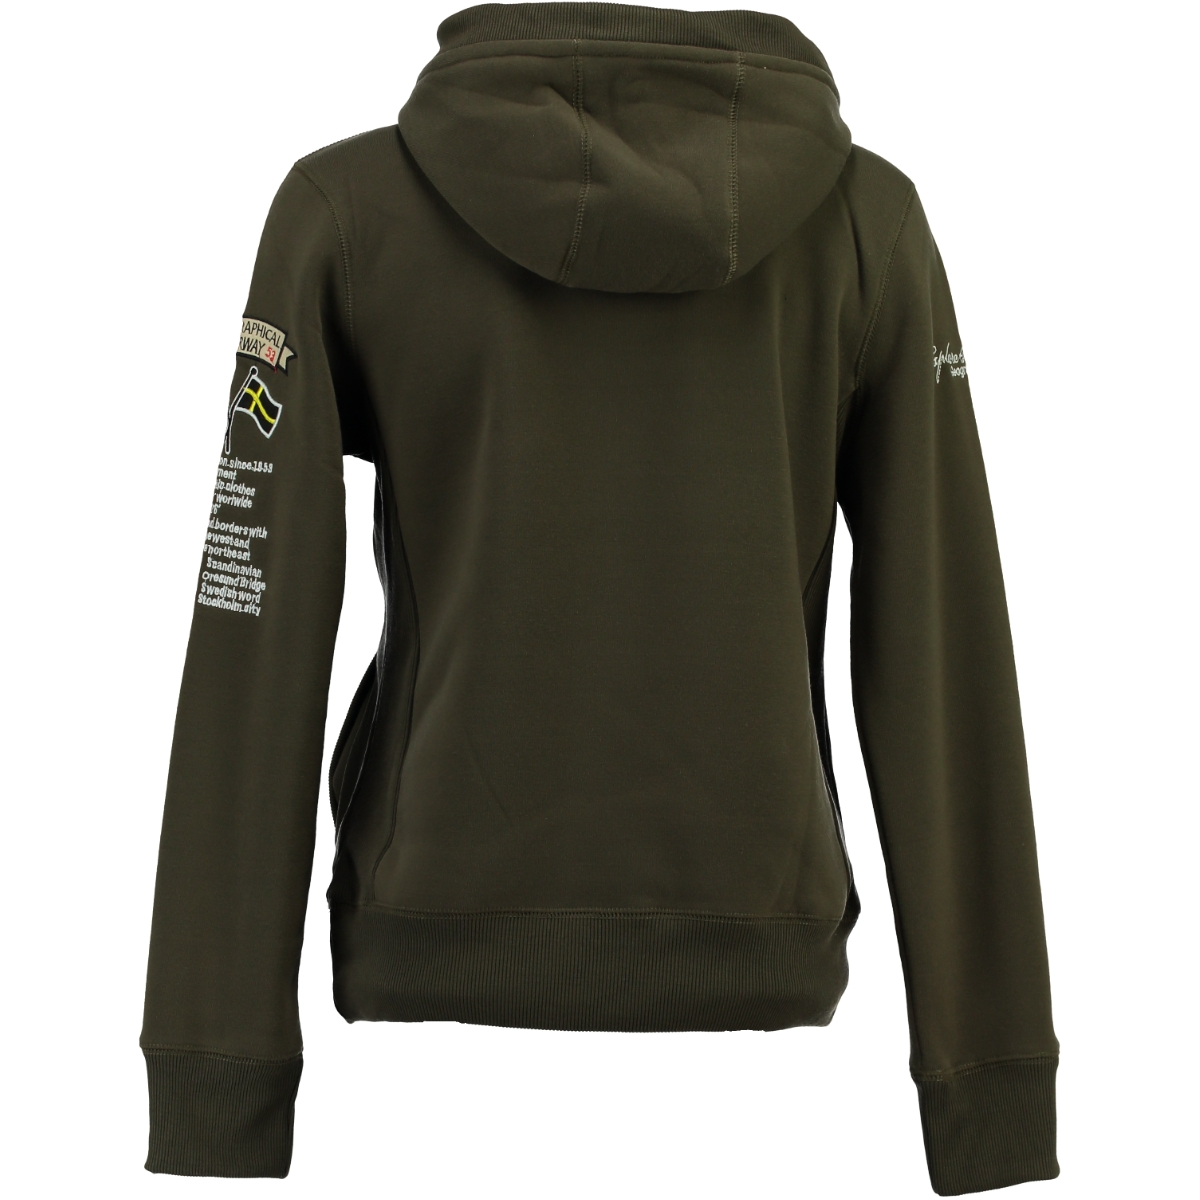 Geographical-Norway-giacca-uomo-autunno-inverno-S-fino-a-3xl-Felpa miniatura 9